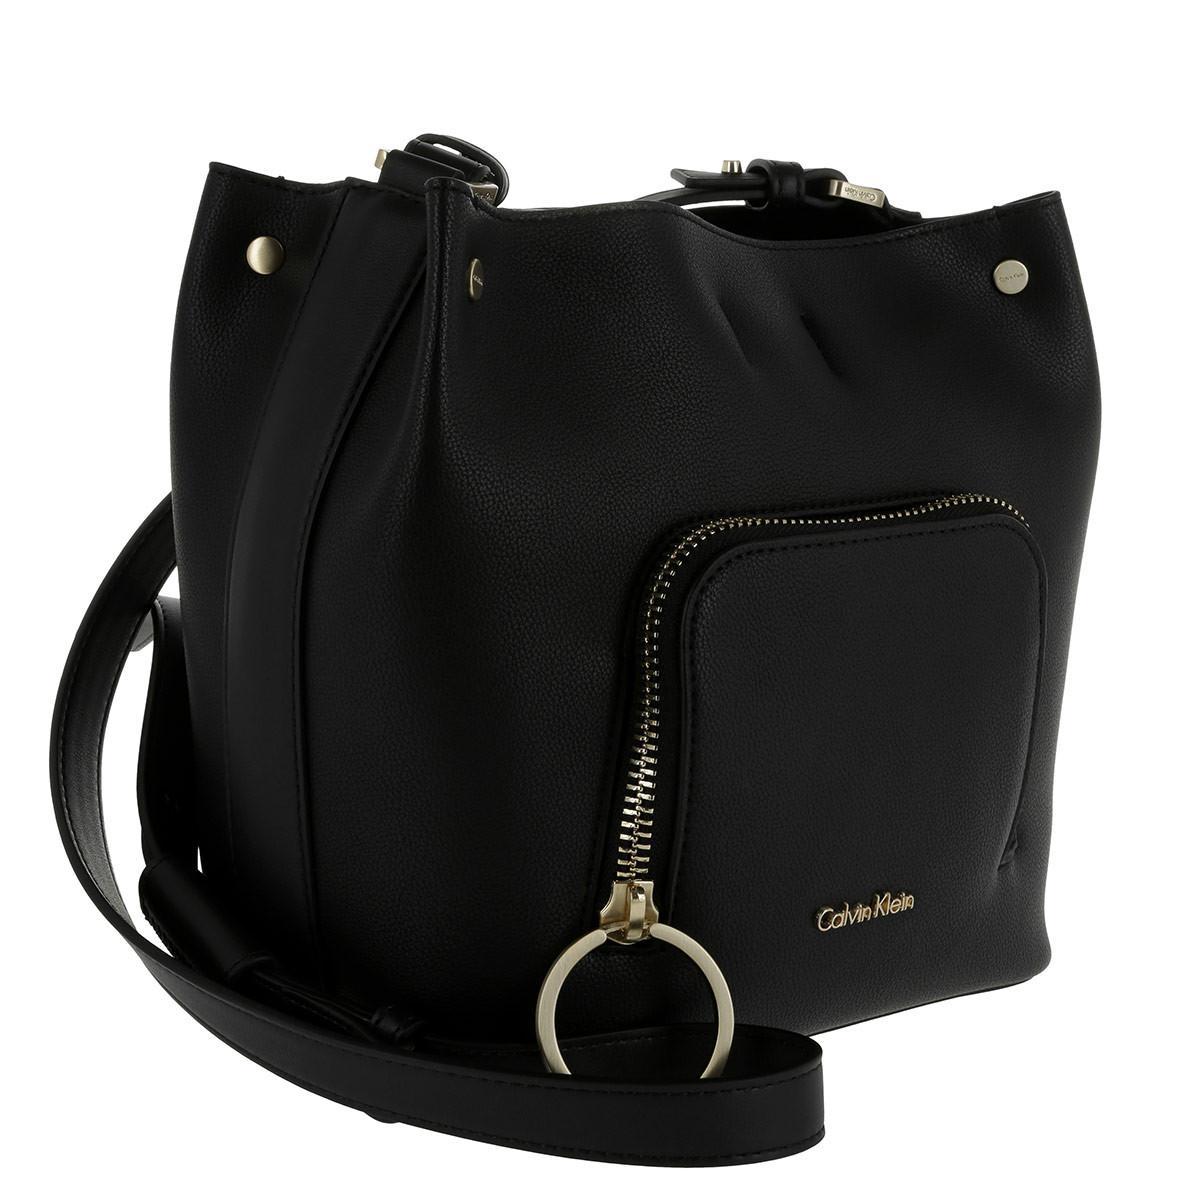 Womens Natasha Cube Cross-Body Bag Black black (black) Calvin Klein w3zhJtSG